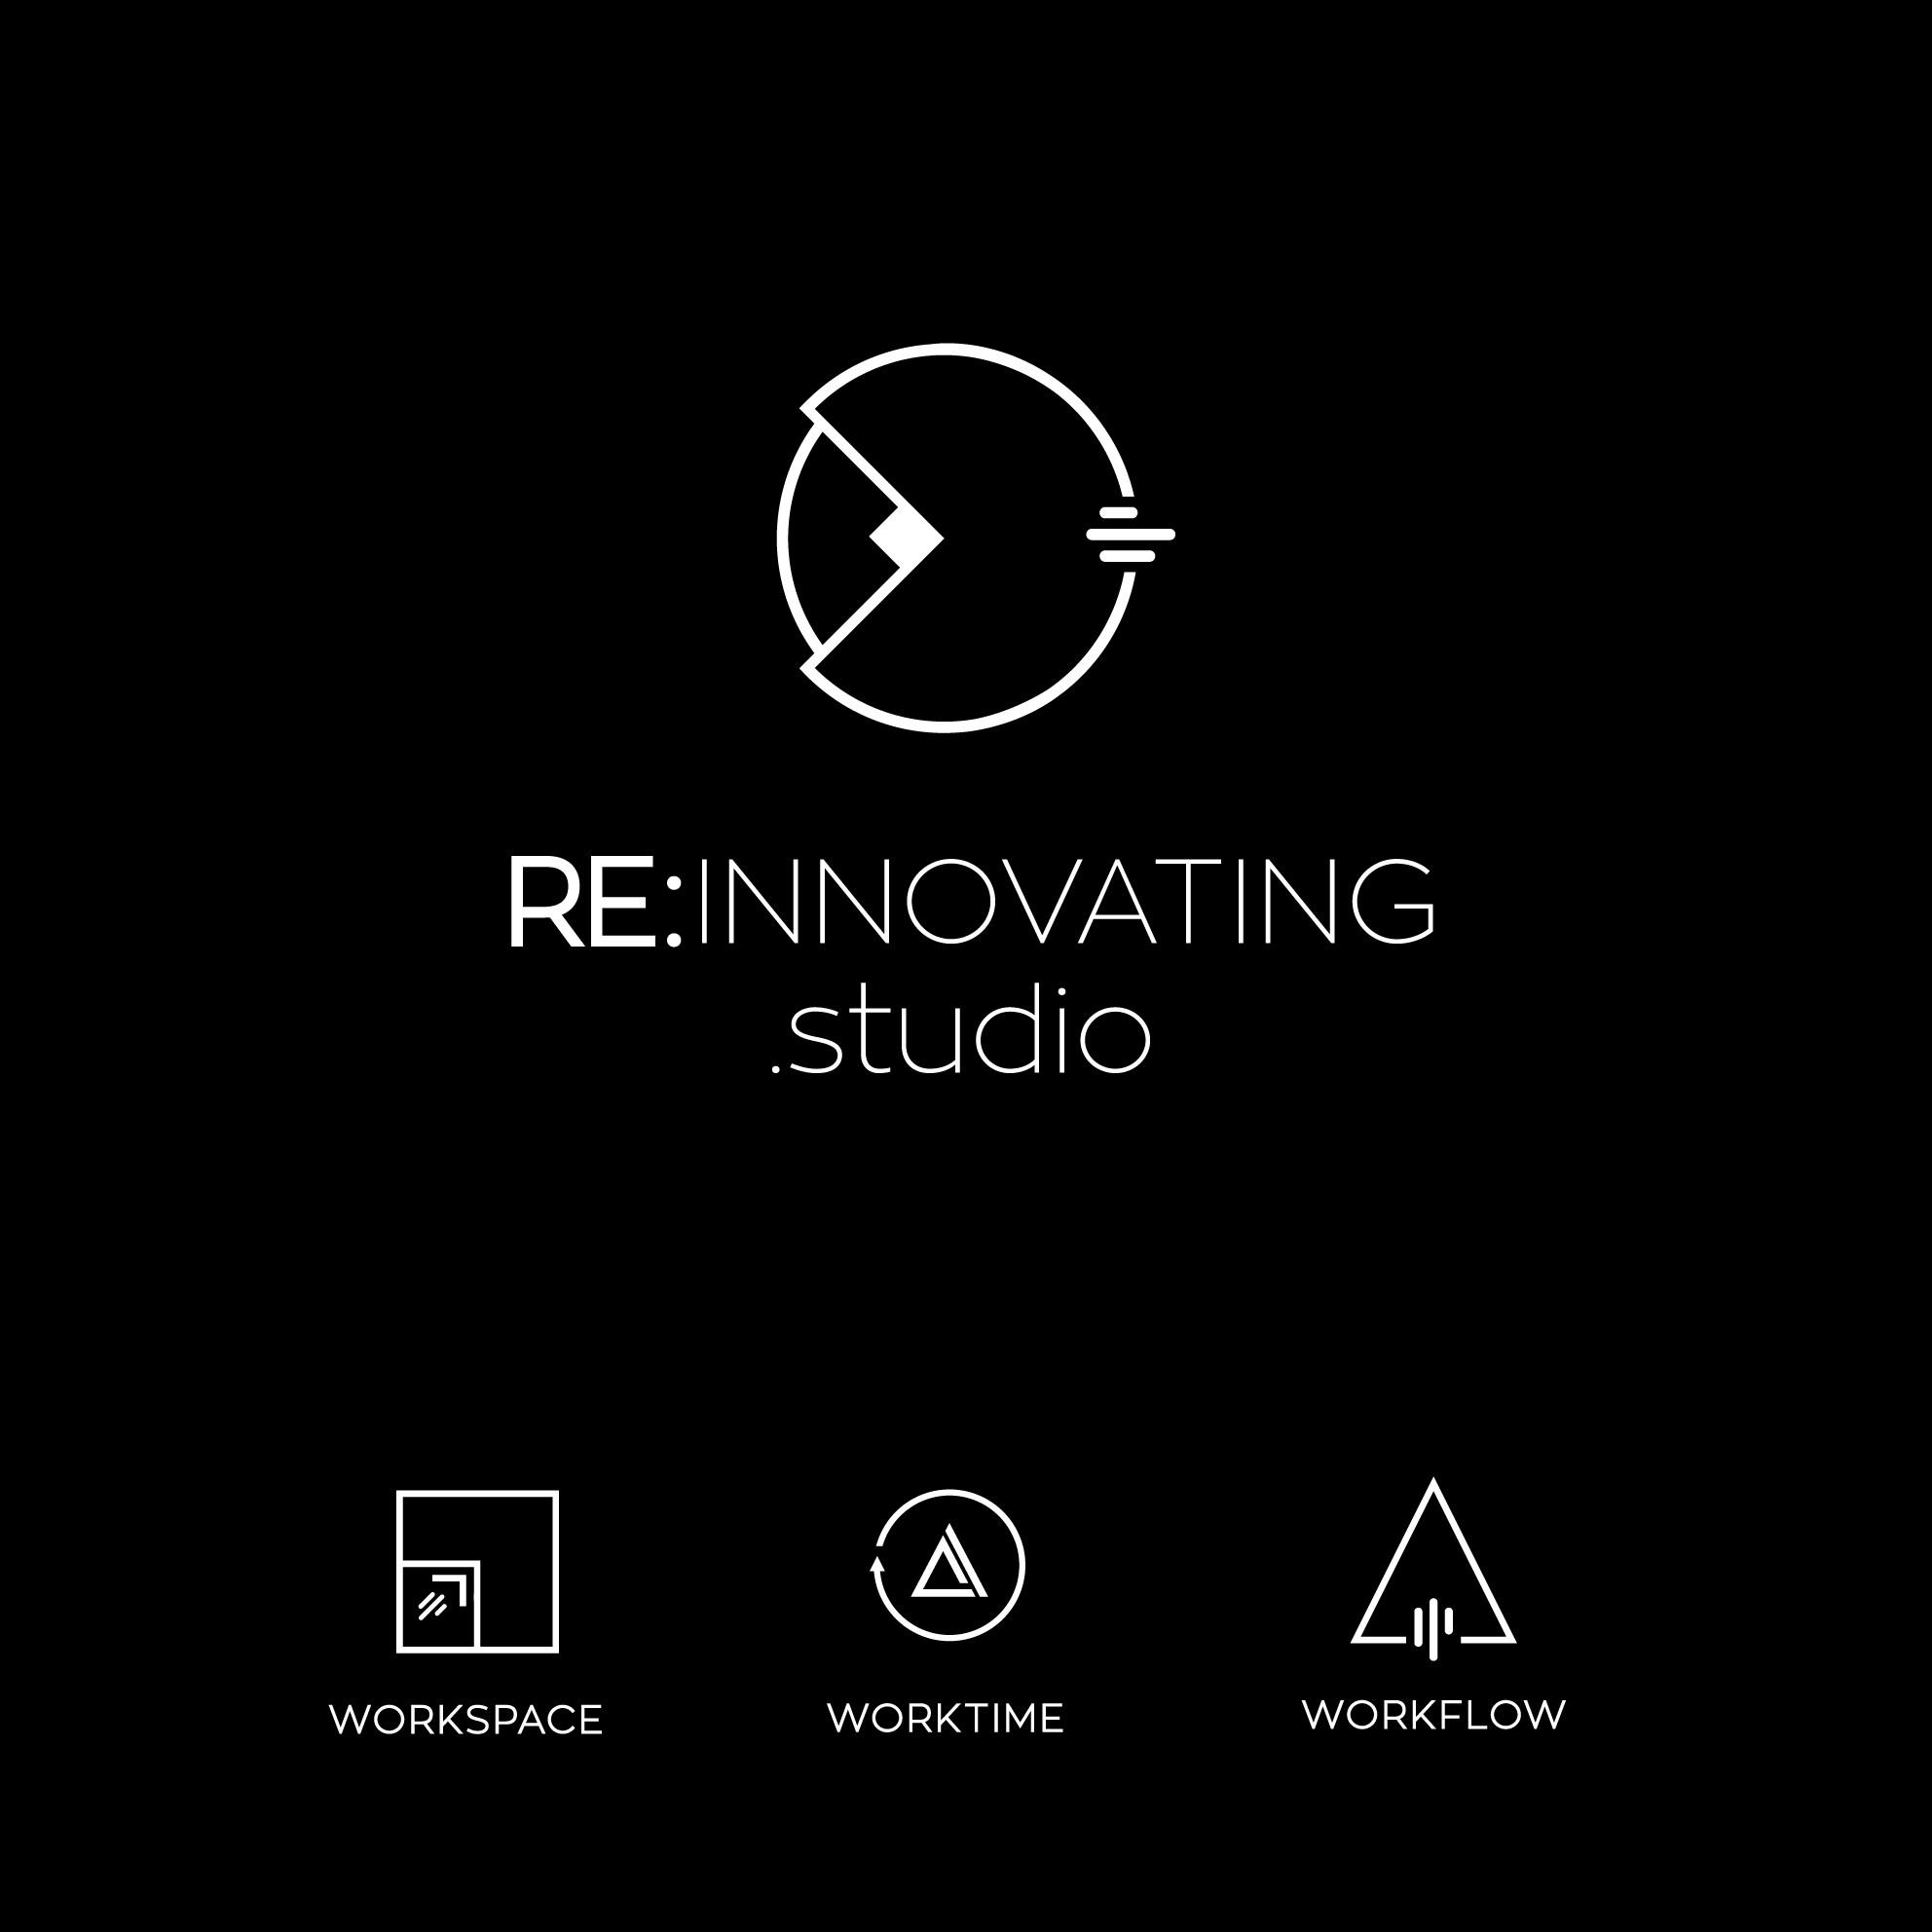 RE:Innovating .studio needs a logo merged from 3 symbols.